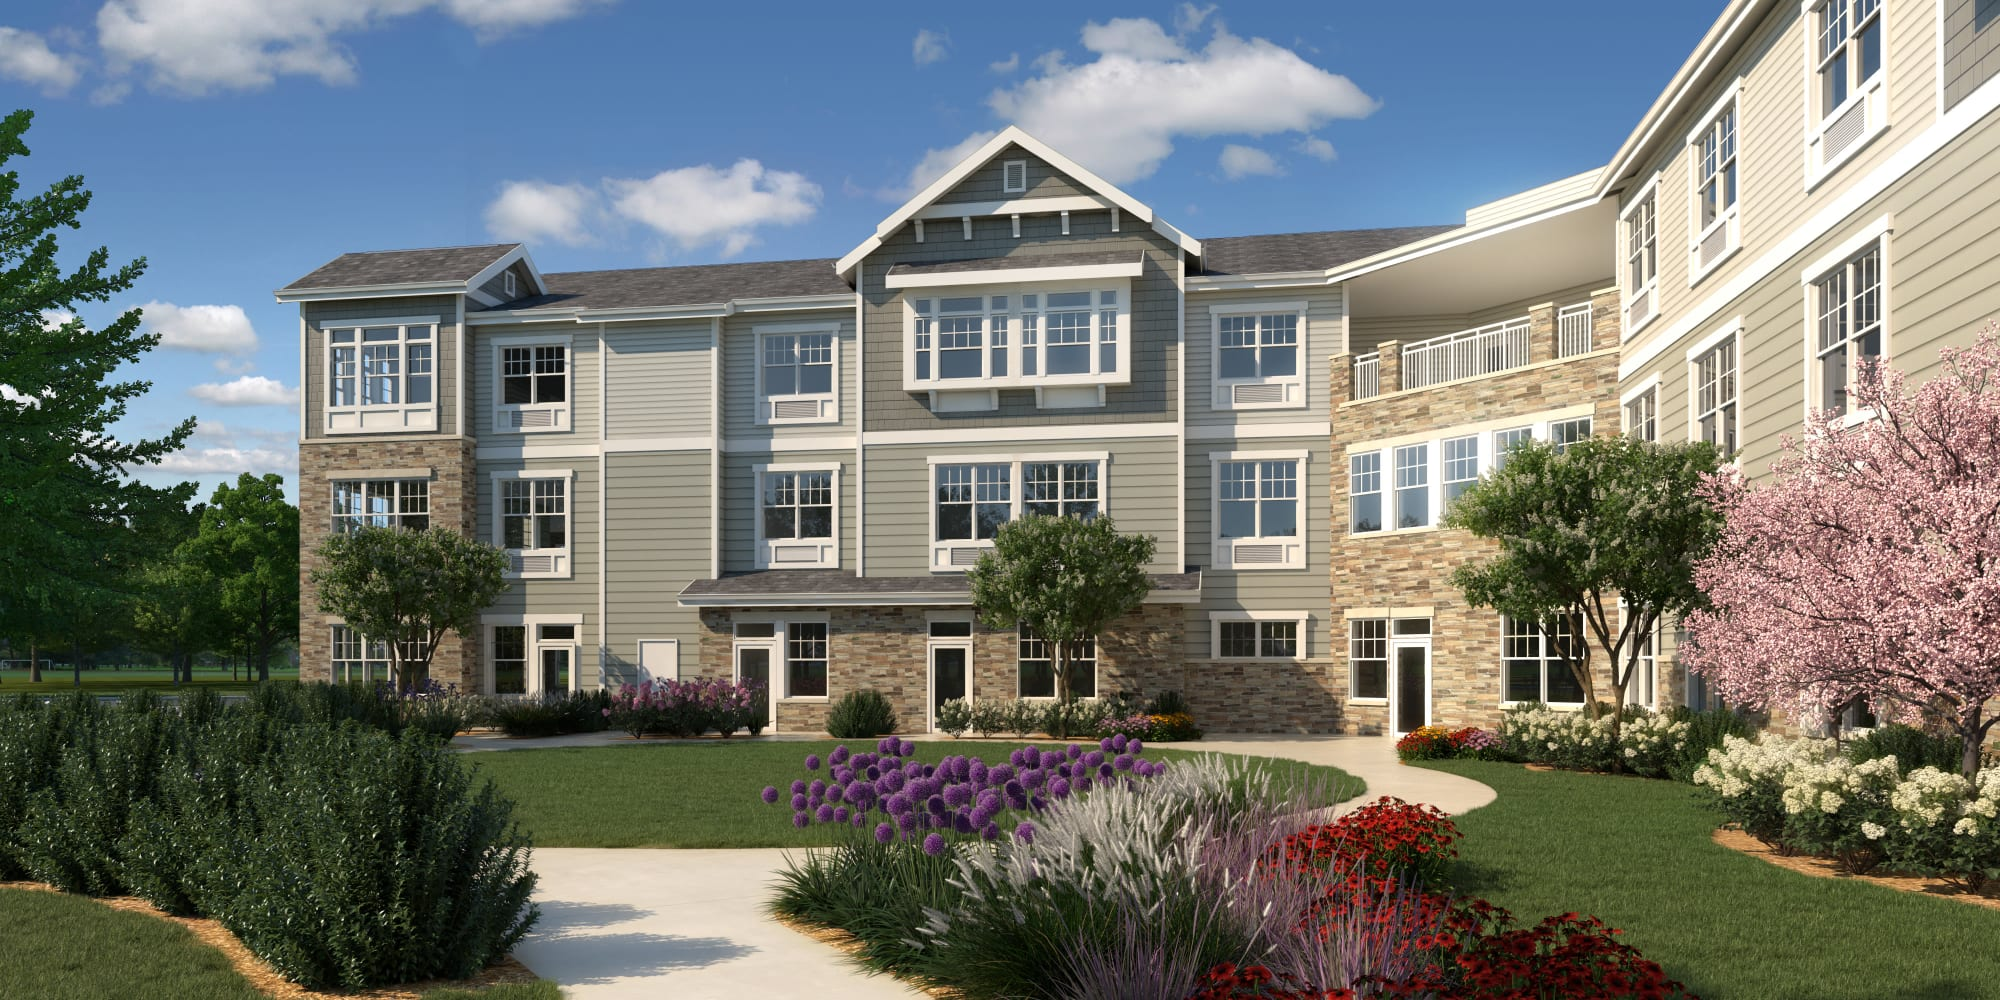 Senior living at Anthology of Farmington Hills  - Opening Early 2022 in Farmington Hills, Michigan